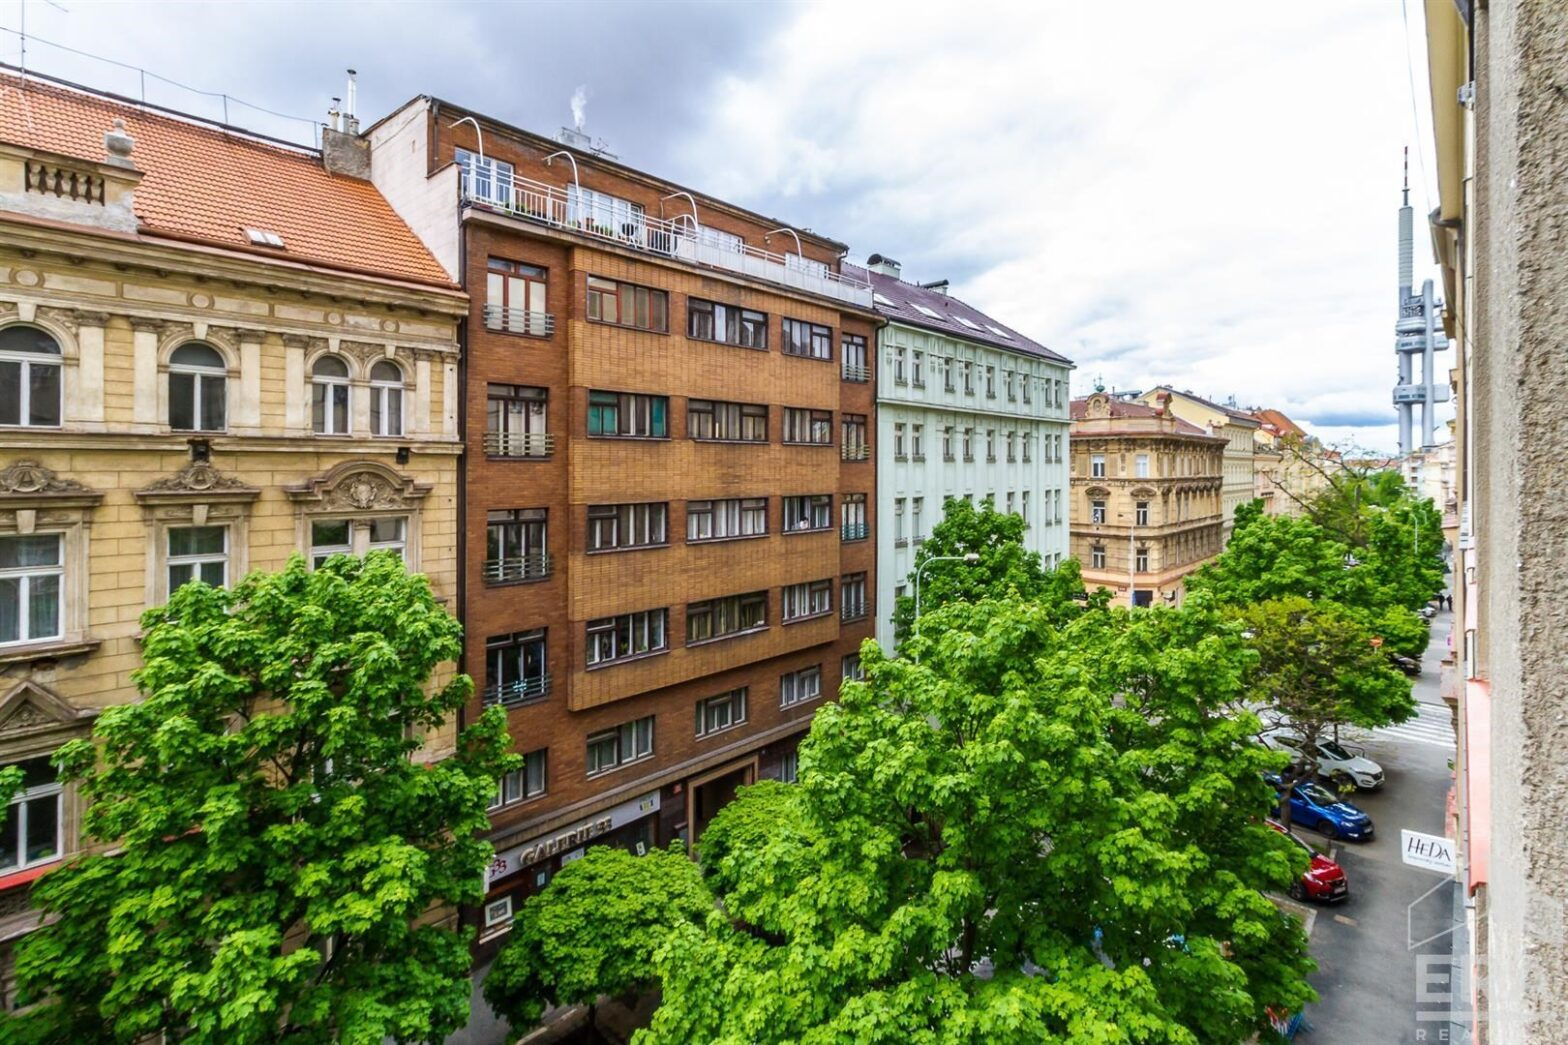 Pronájem bytu 2+1, 70 m2, Praha 3 Vinohrady